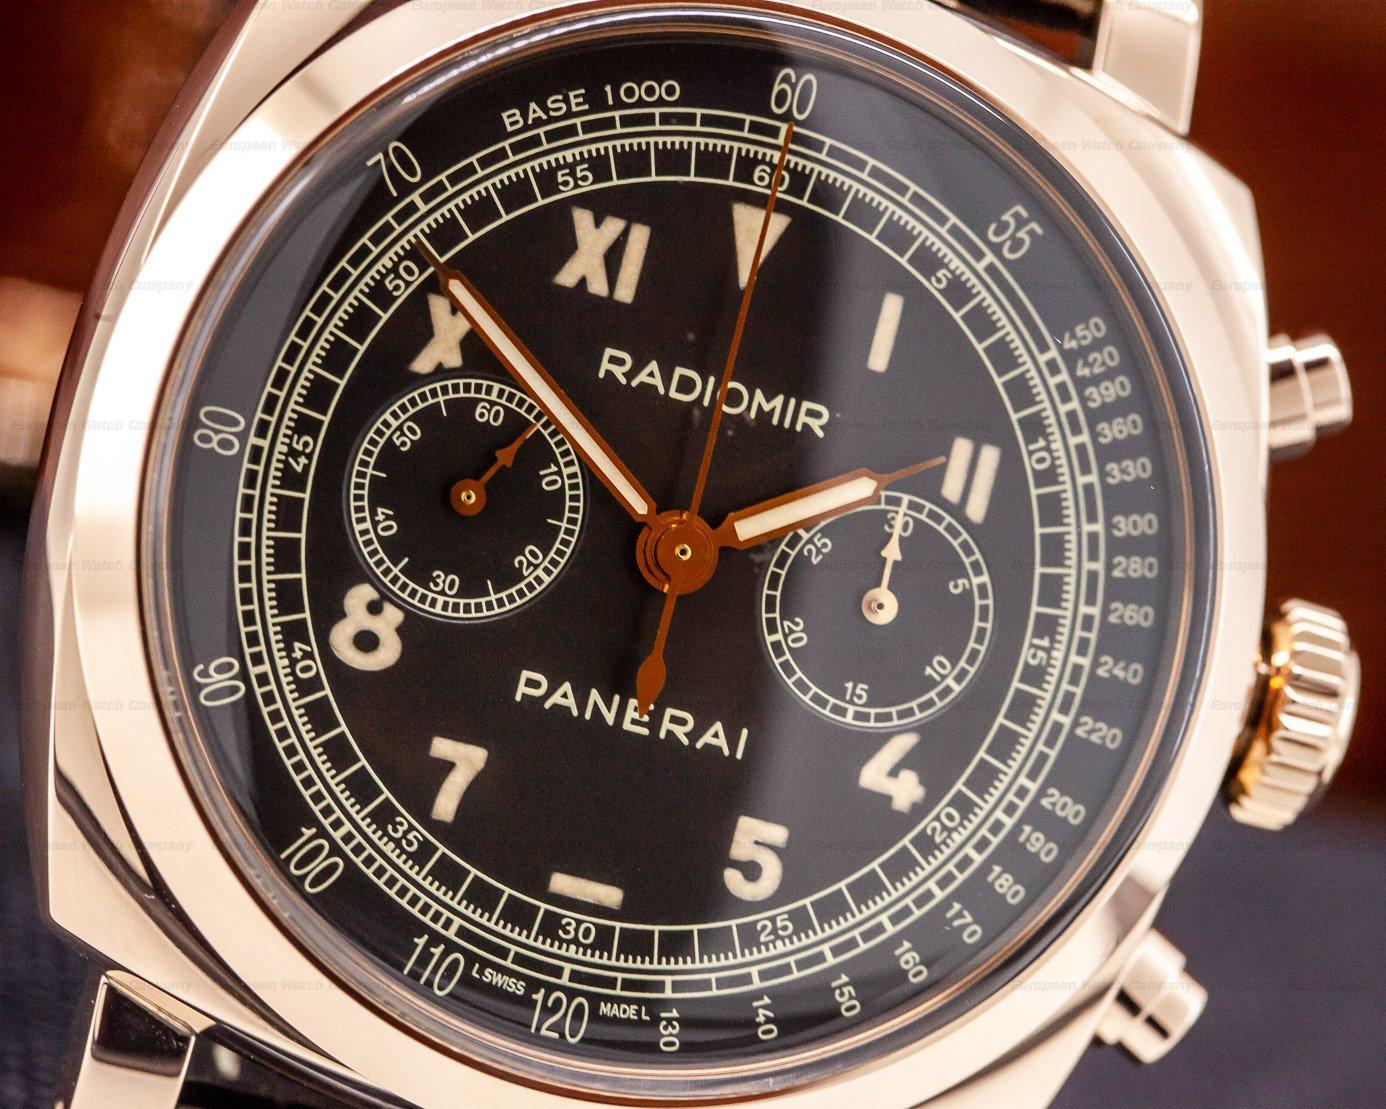 Panerai PAM00519 Radiomir 1940 Chronograph 18k Rose Gold LIMITED